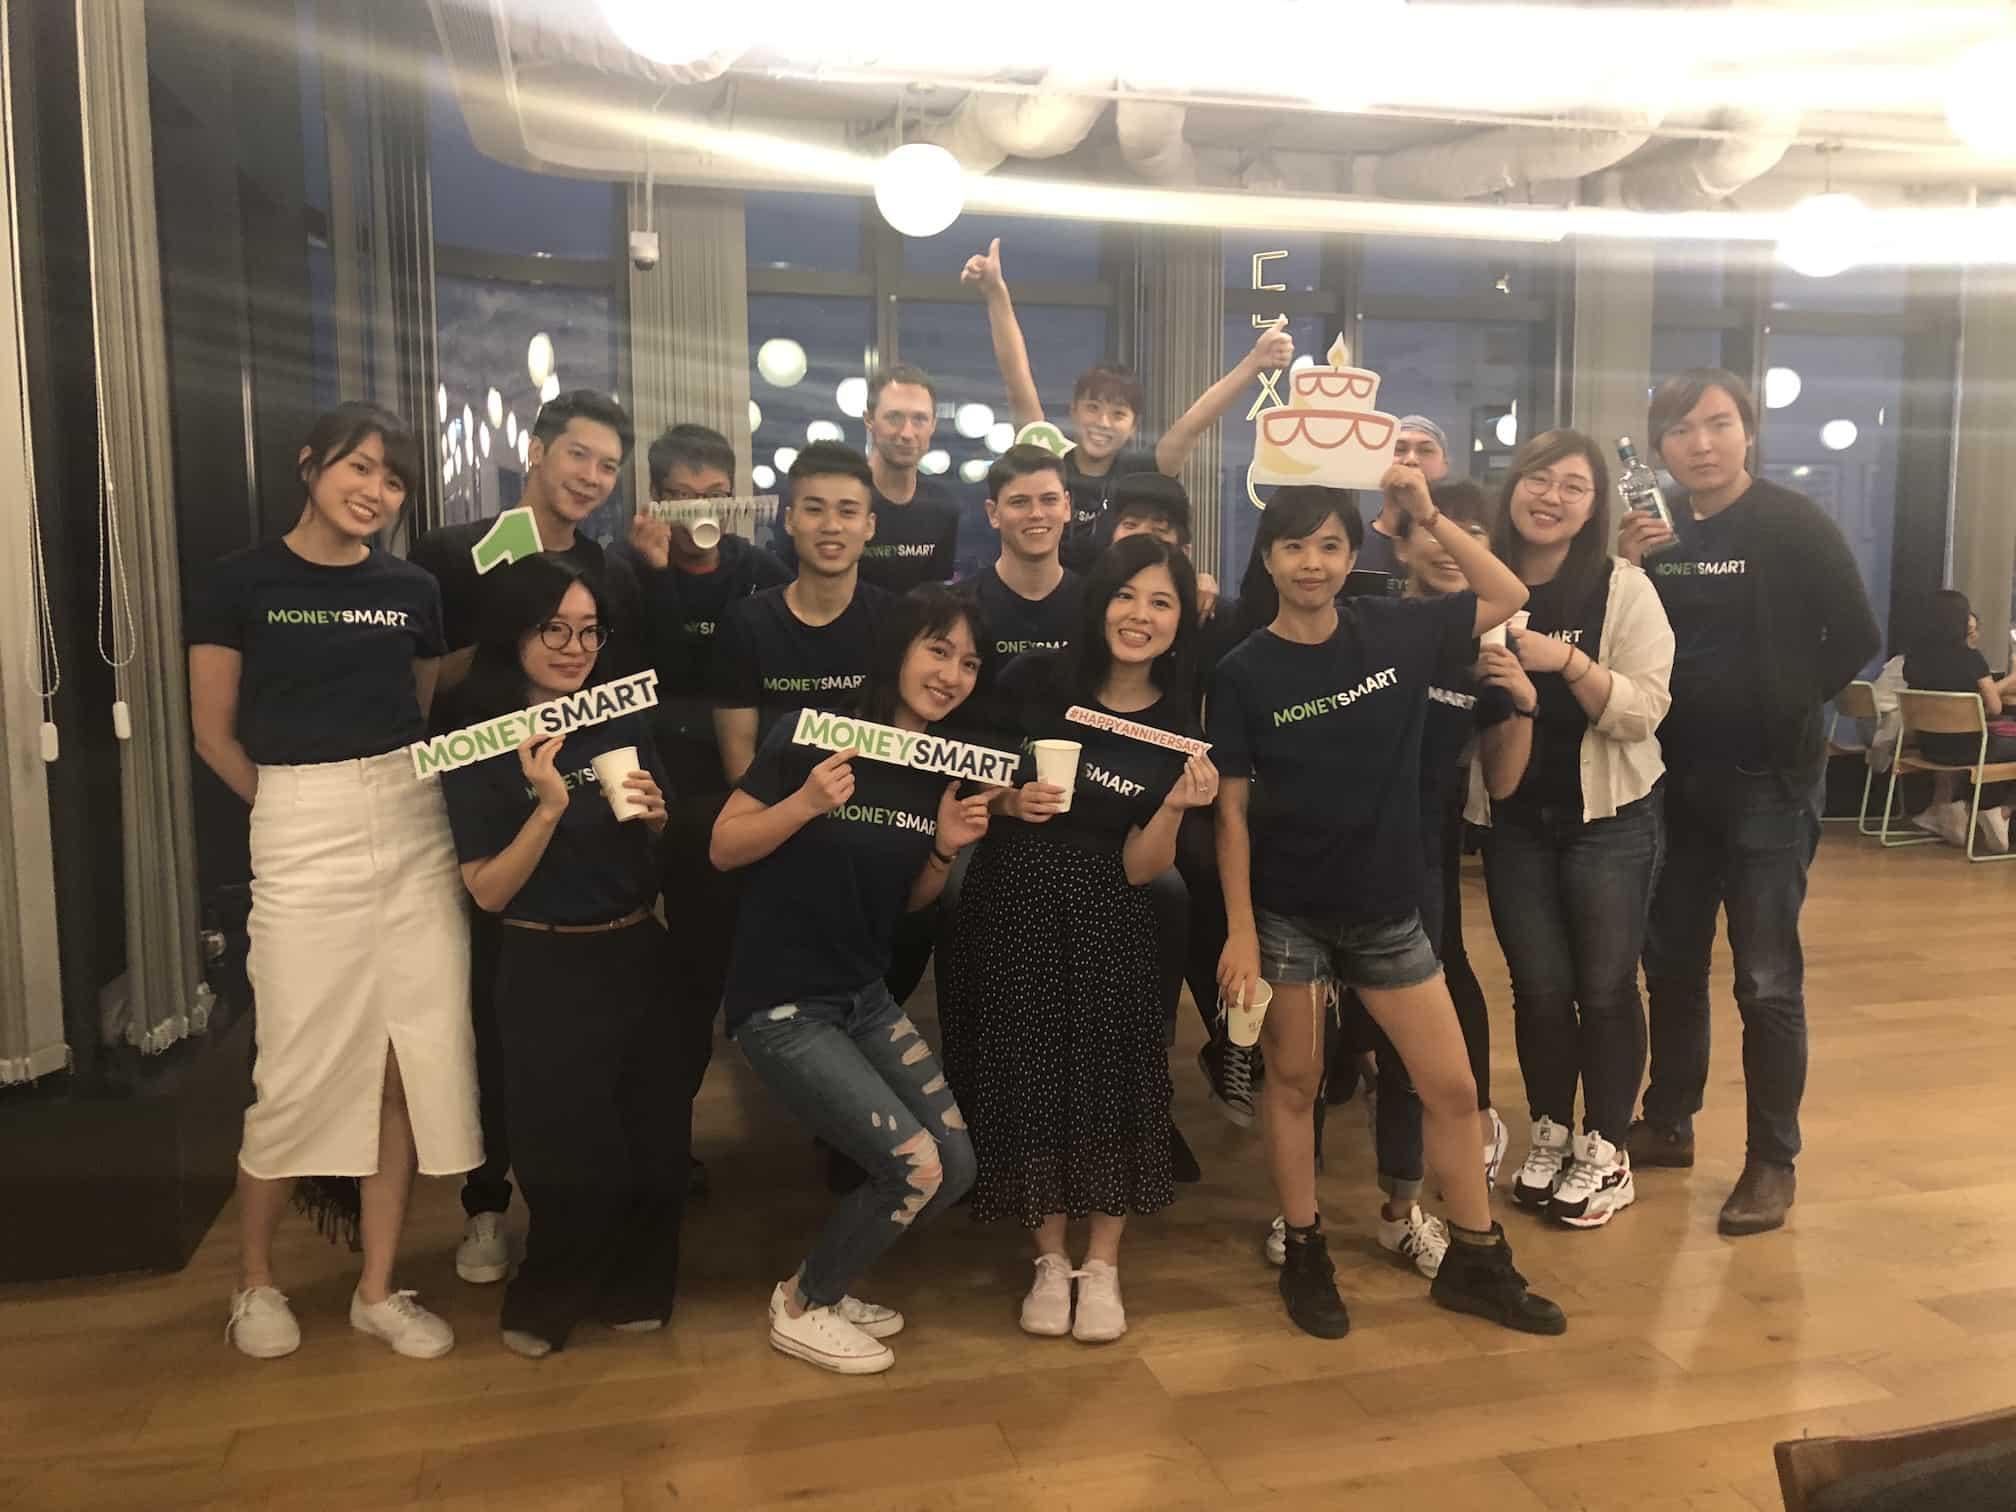 Moneysmart (SG) - Content Manager